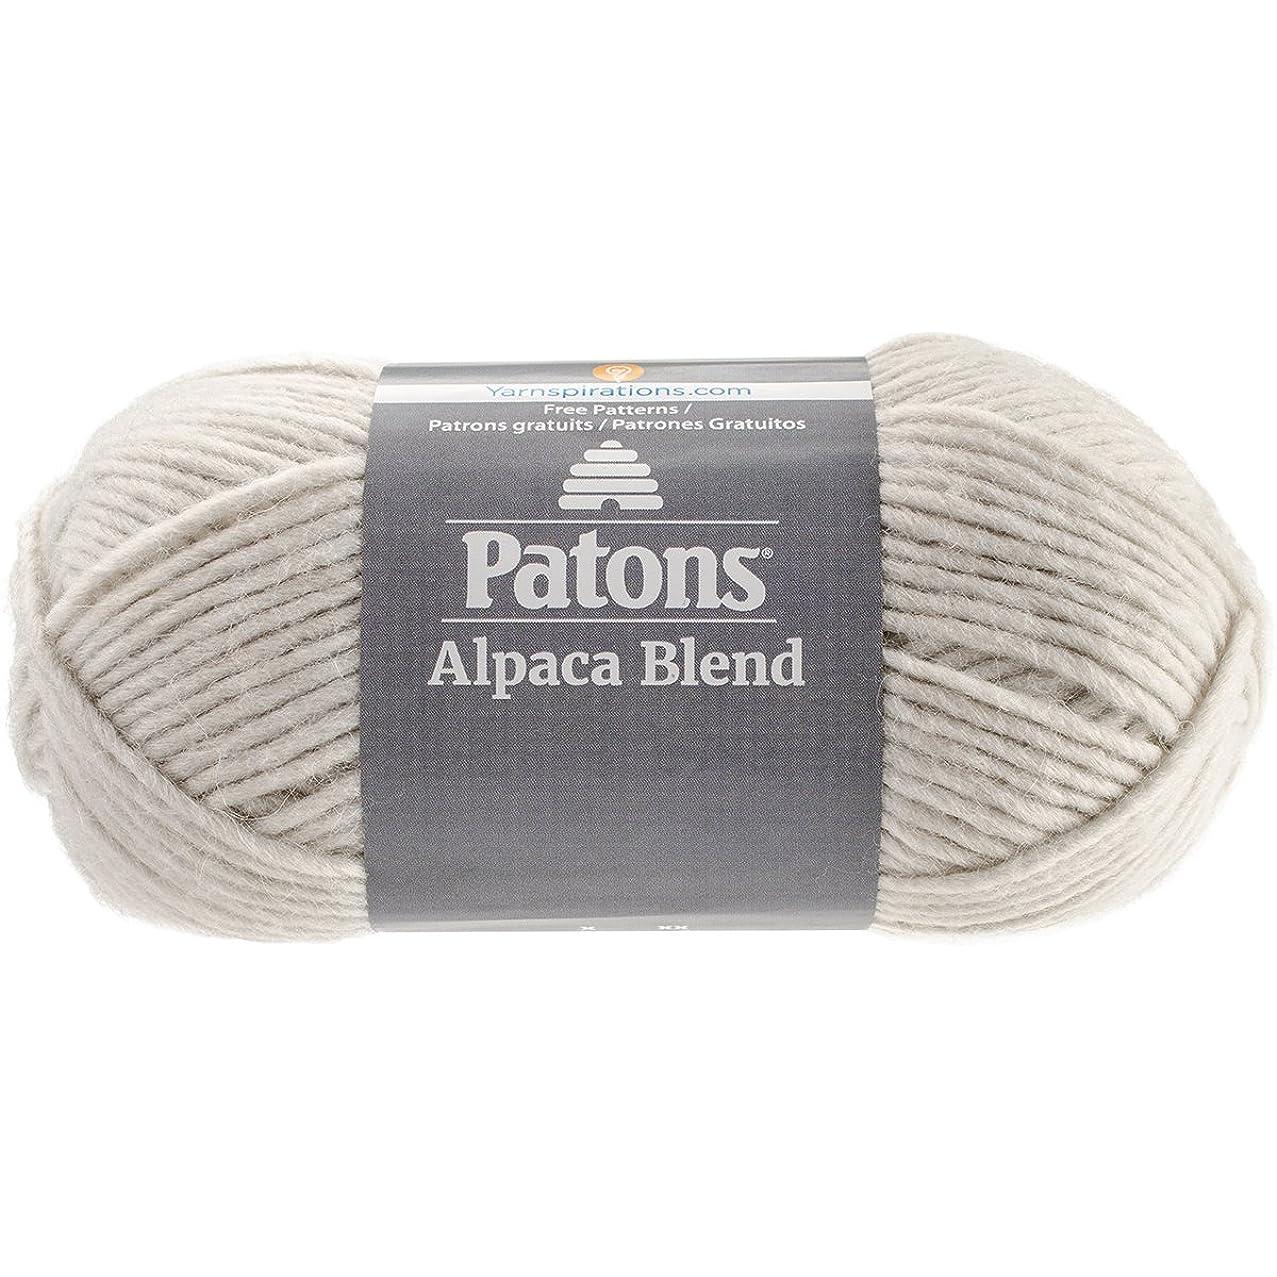 Patons  Alpaca Blend Yarn - (5) Bulky Gauge  - 3.5oz -  Birch -  Machine Washable  For Crochet, Knitting & Crafting